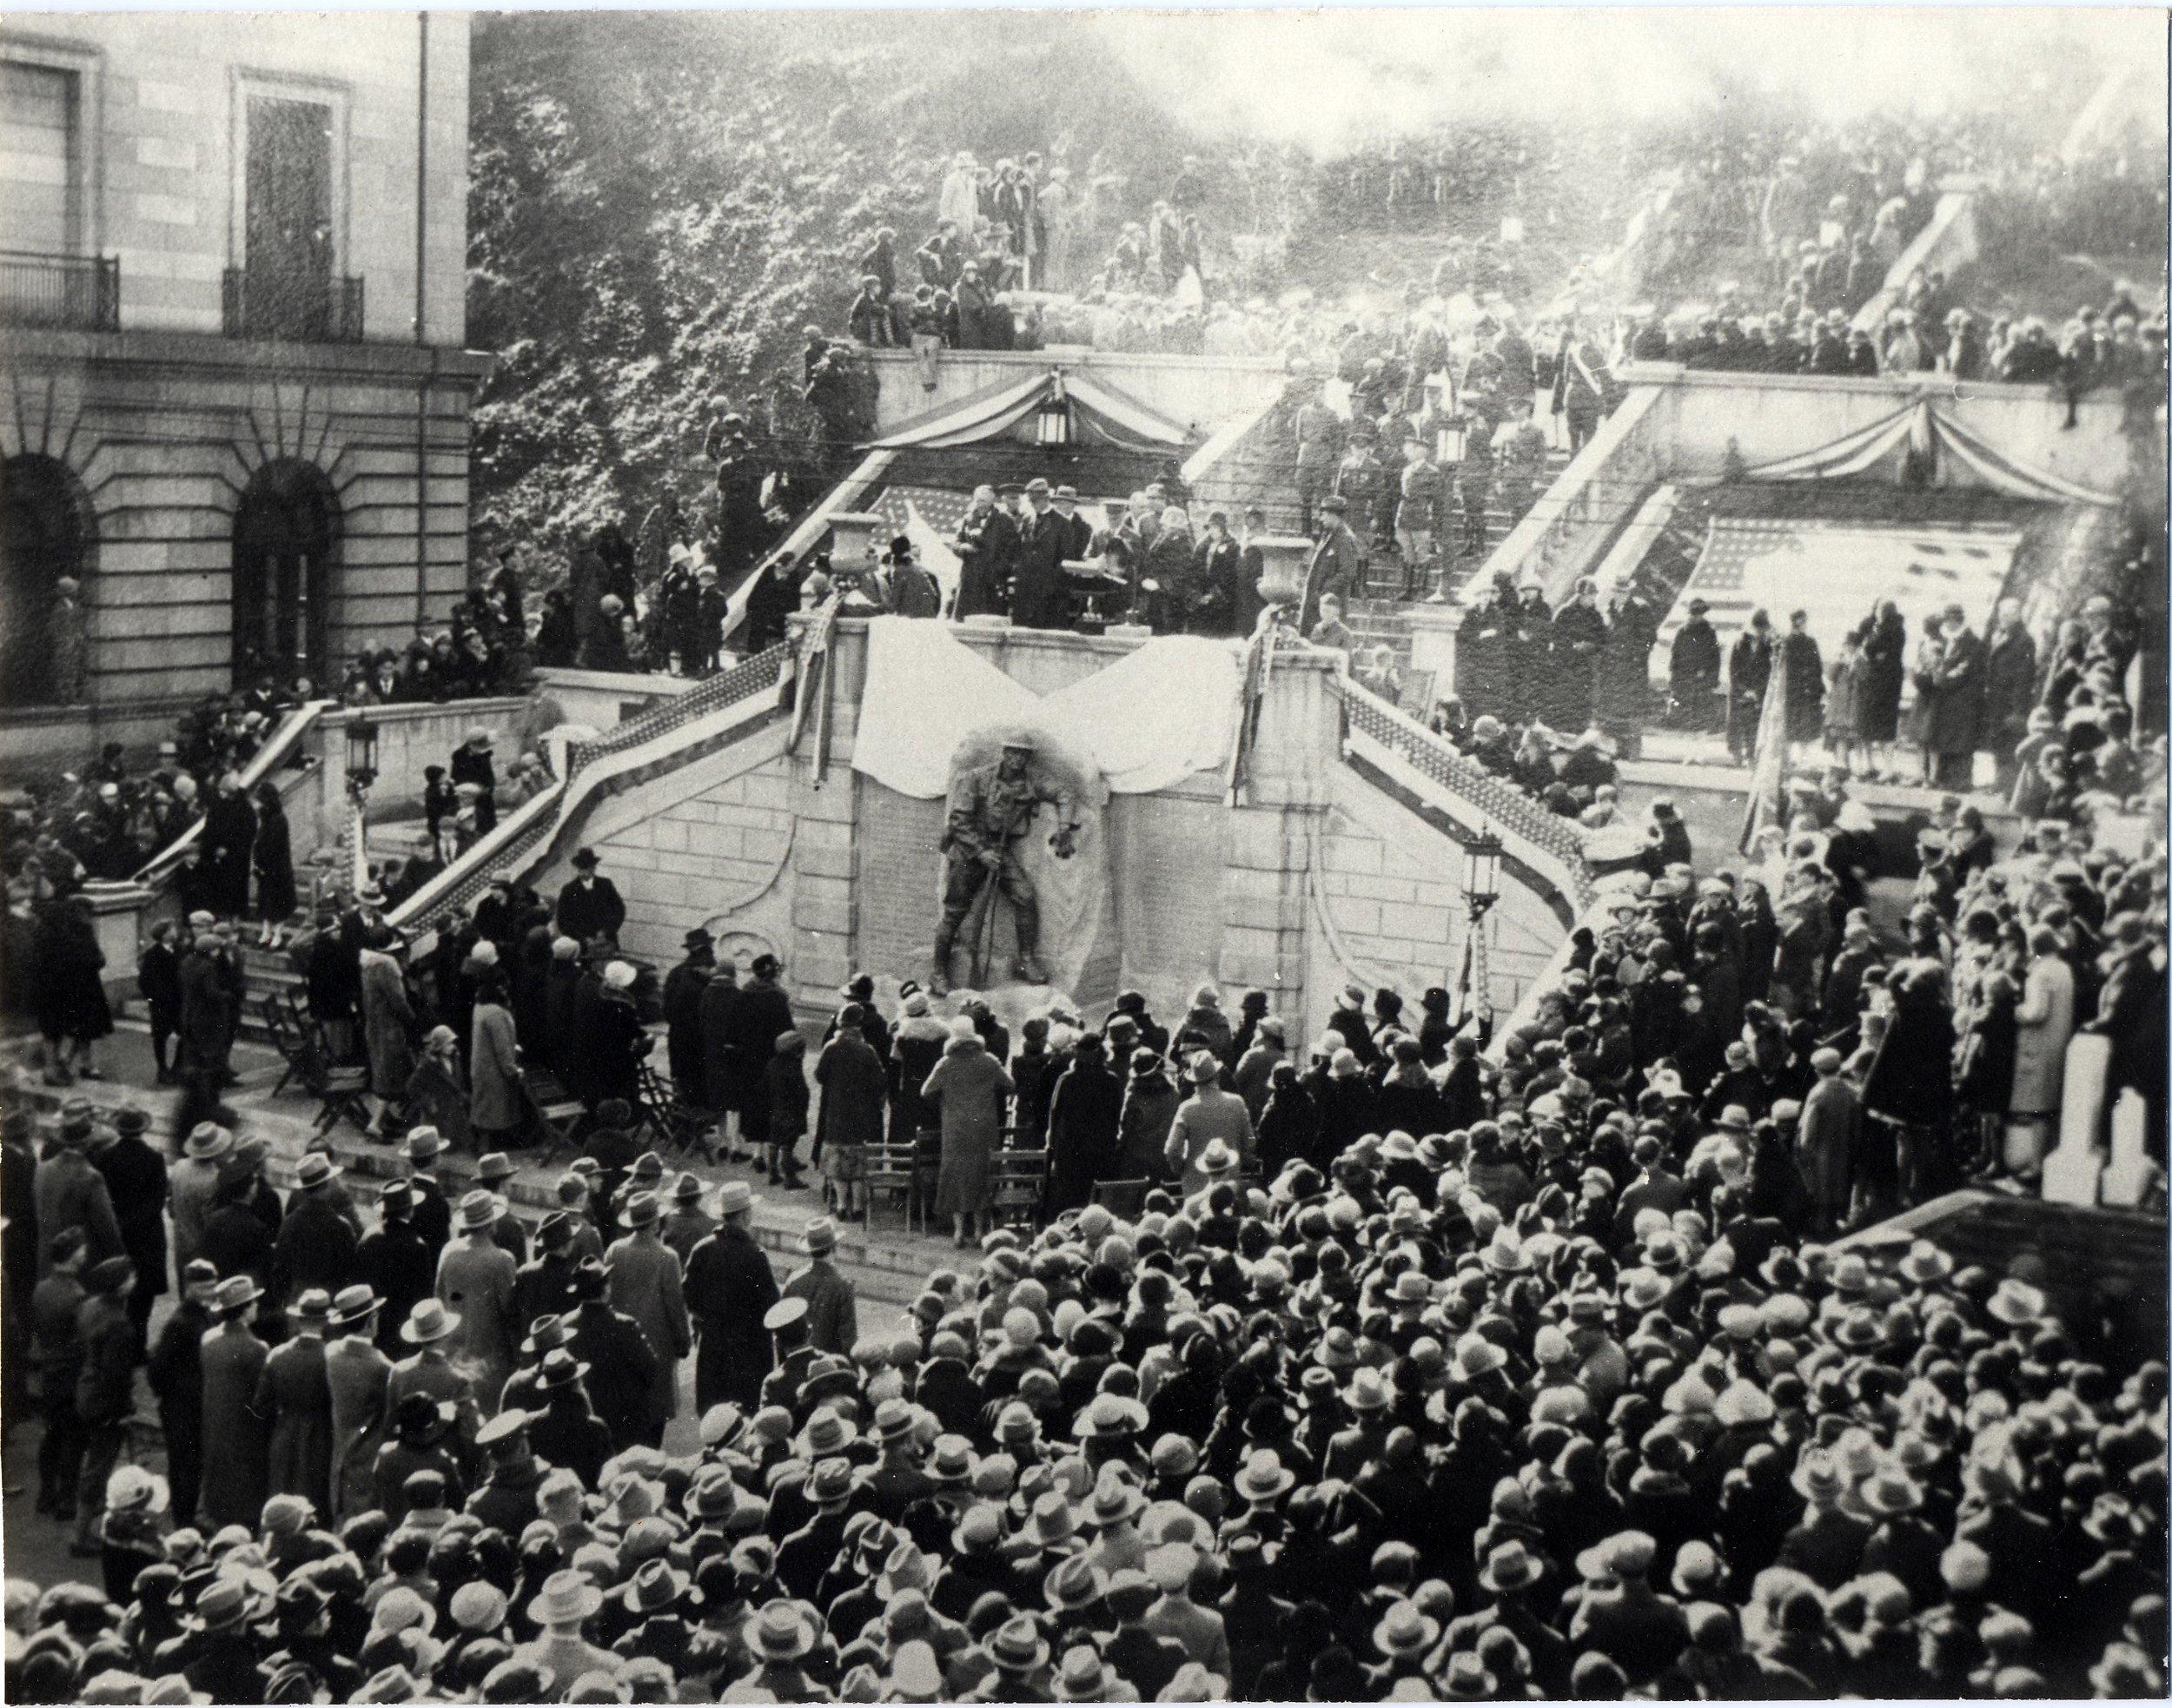 87.49.34 Dedication Soldier Statue Monument Terrace 1926.jpg